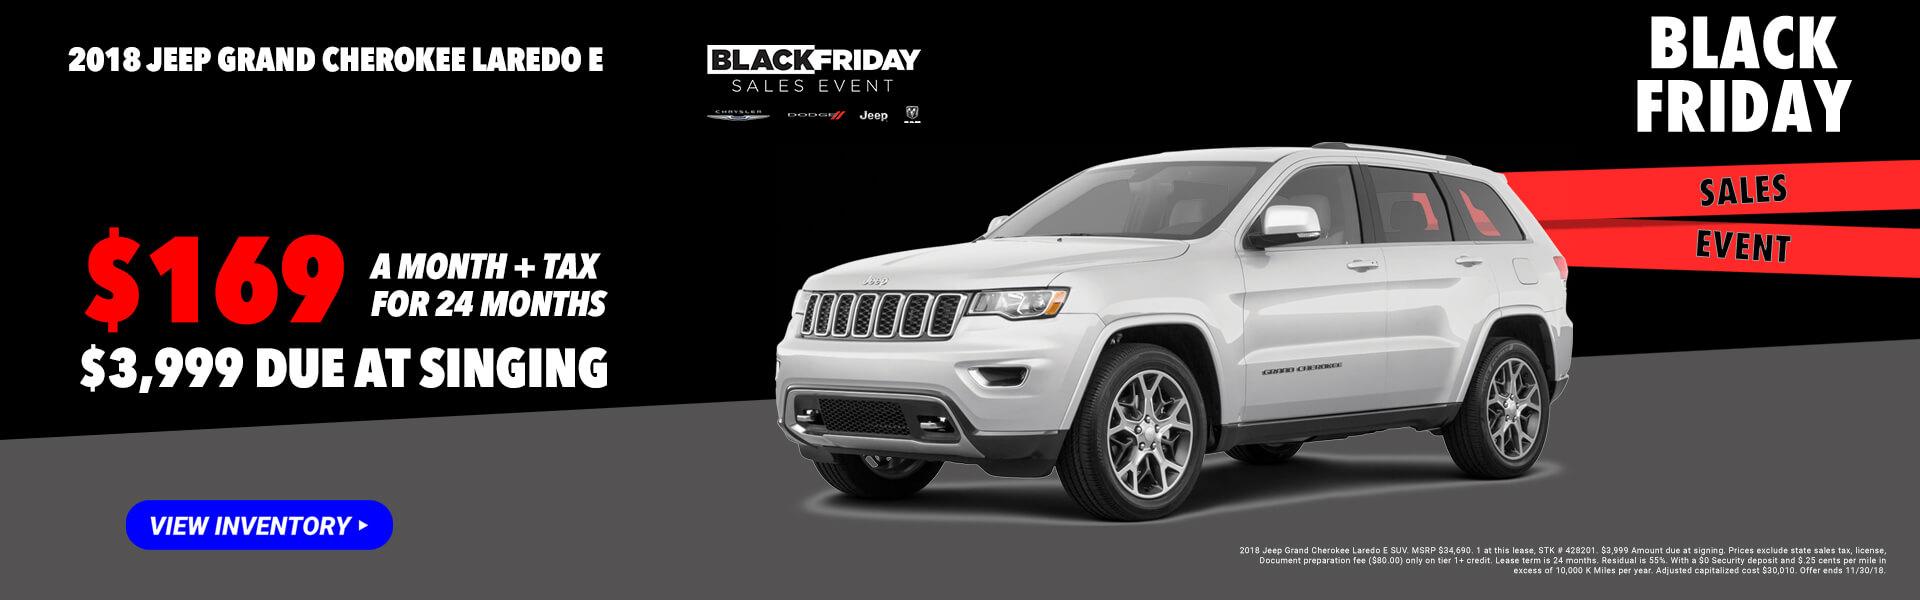 2018 Jeep Grand Cherokee 428201